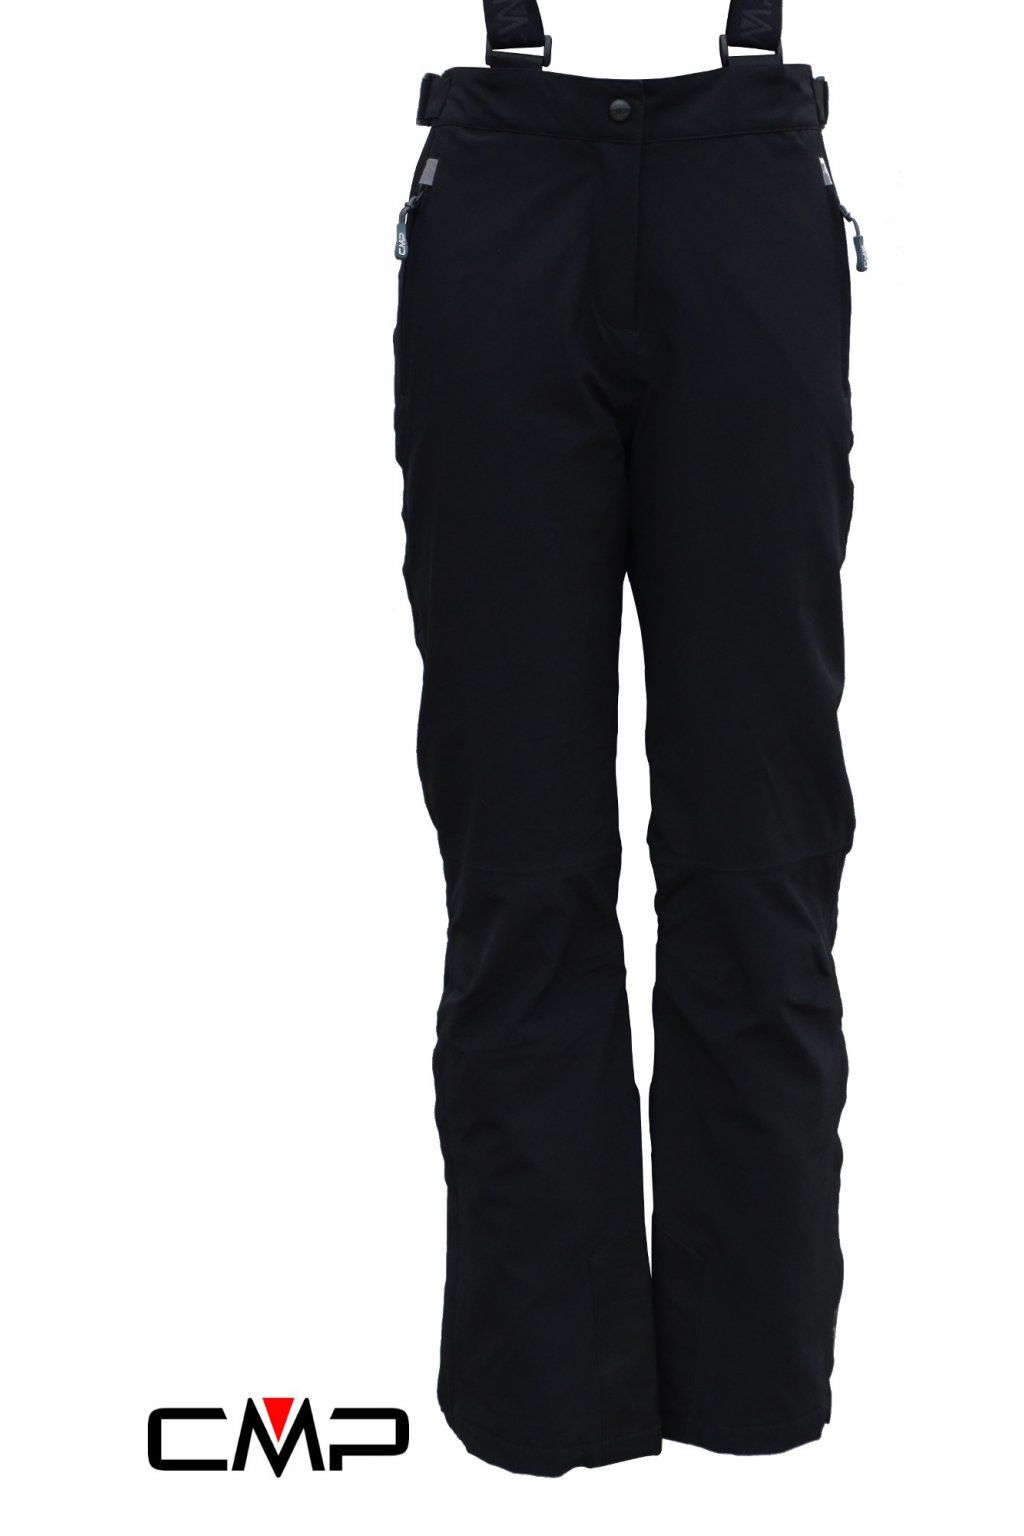 3w18496n u901 damske lyziarske nohavice cmp ski salopette